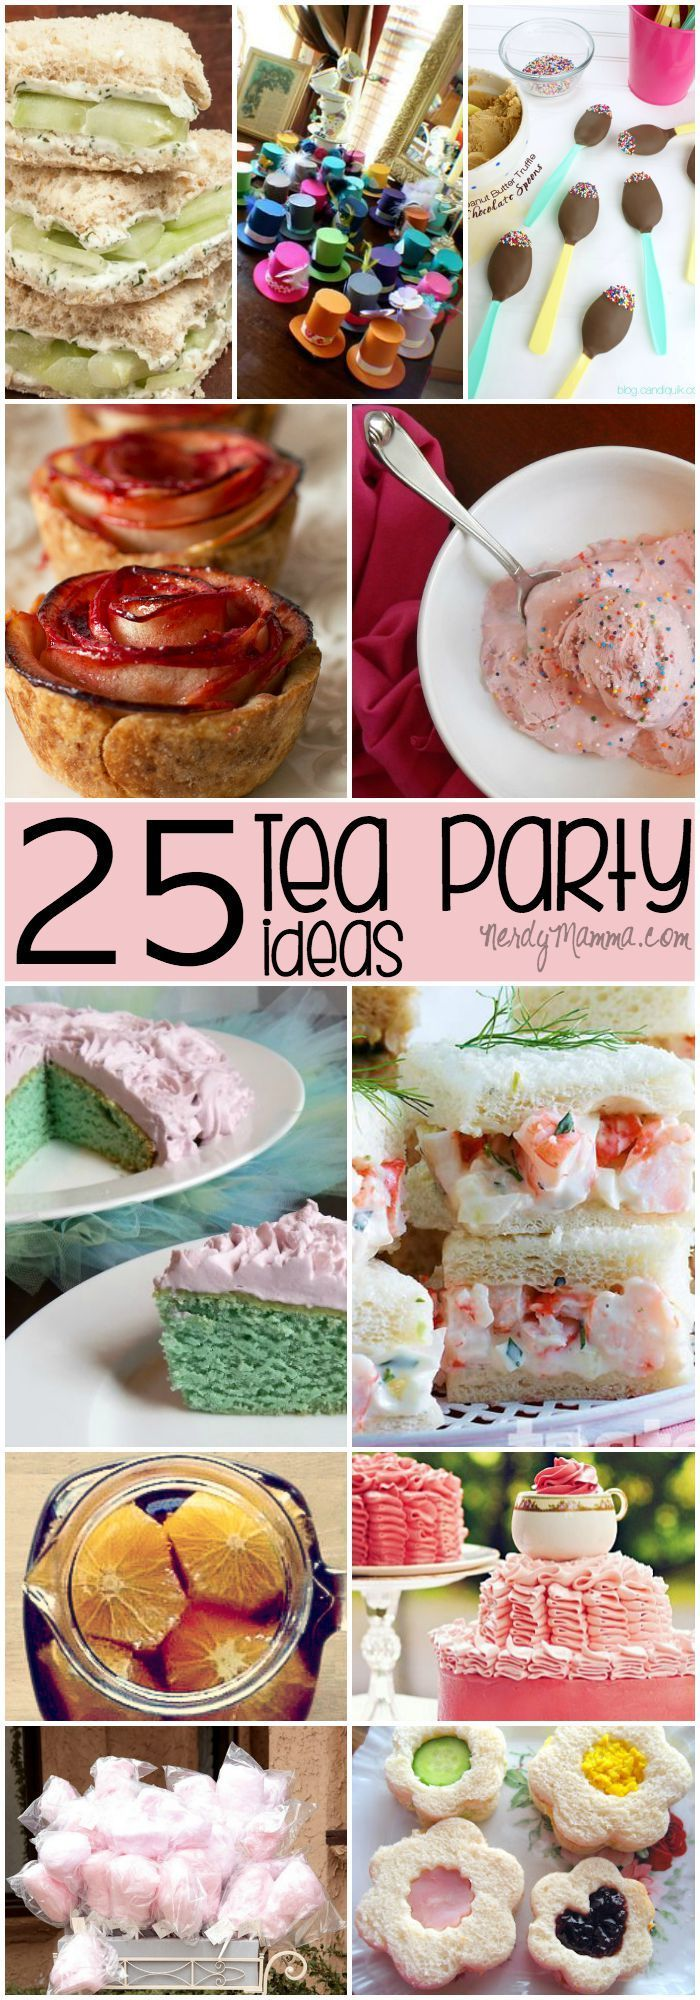 love these 25 Tea Party Ideas for a little girl's birthday! So cute!